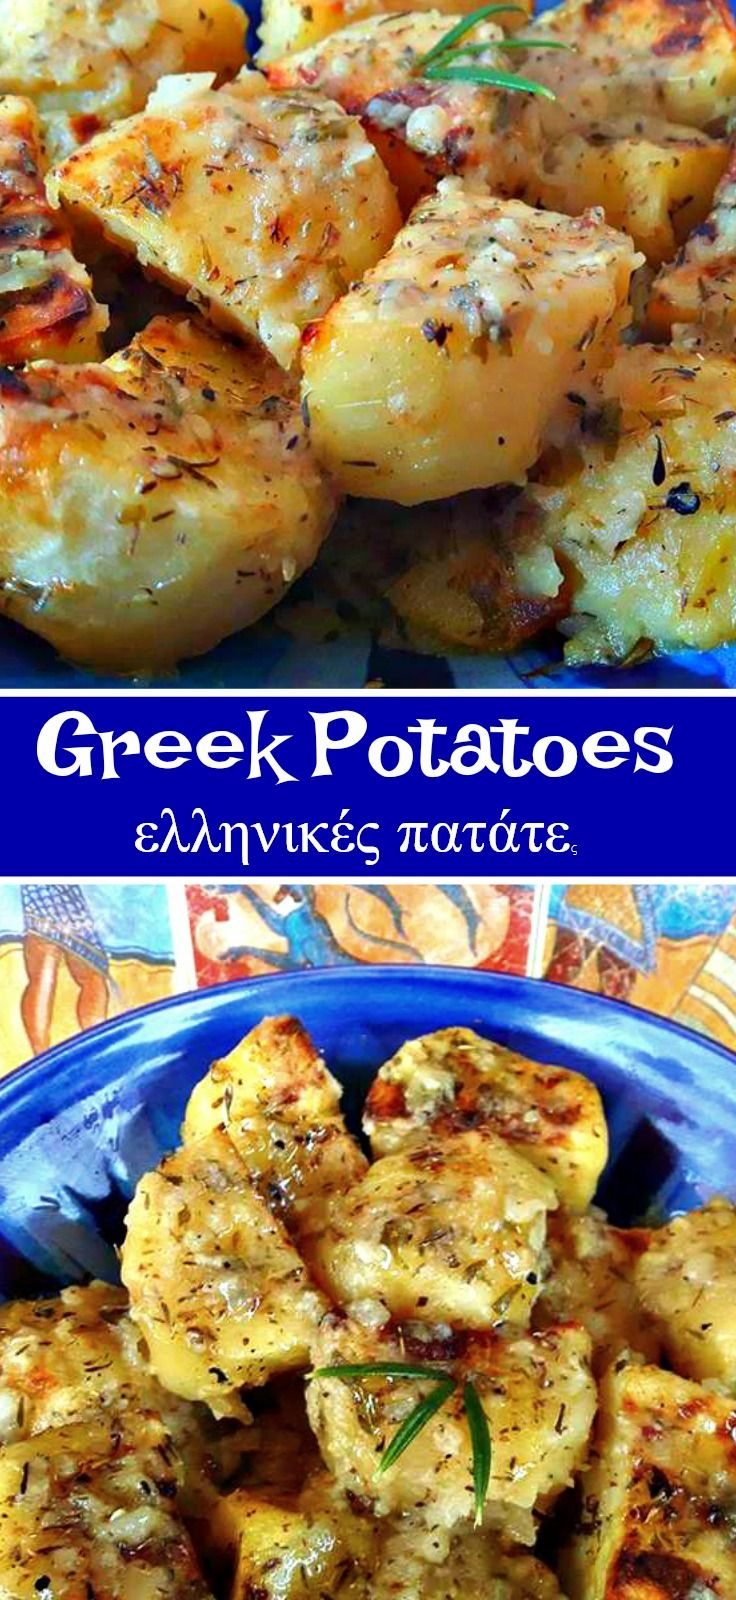 Untitled-1 Greek Potatoes